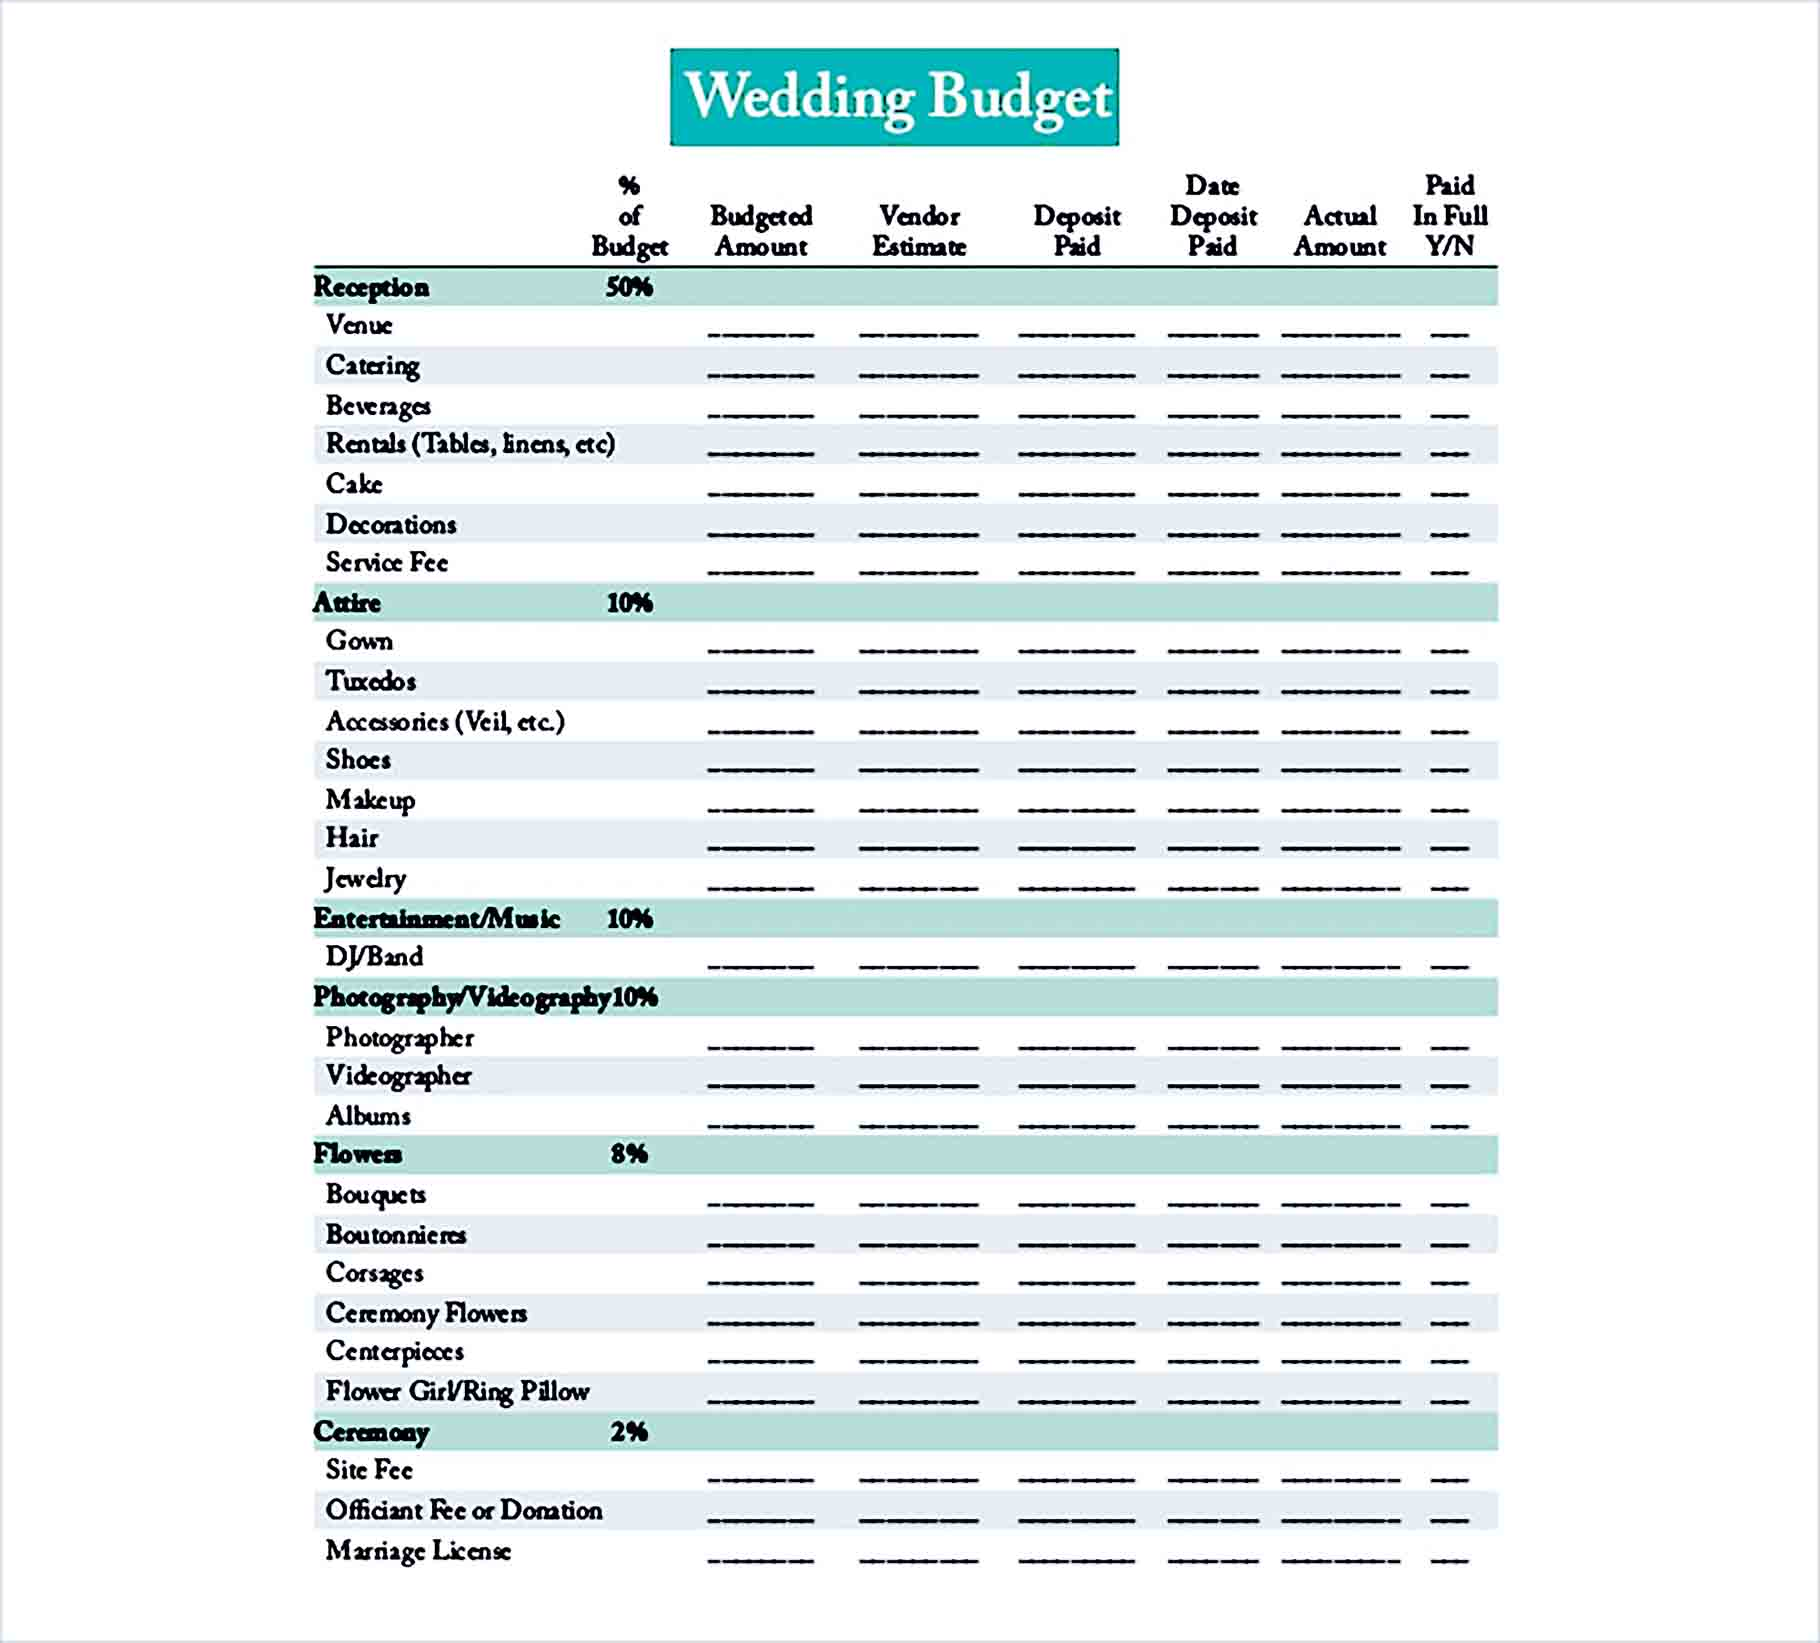 Sample Editable Wedding Budget Planner Free